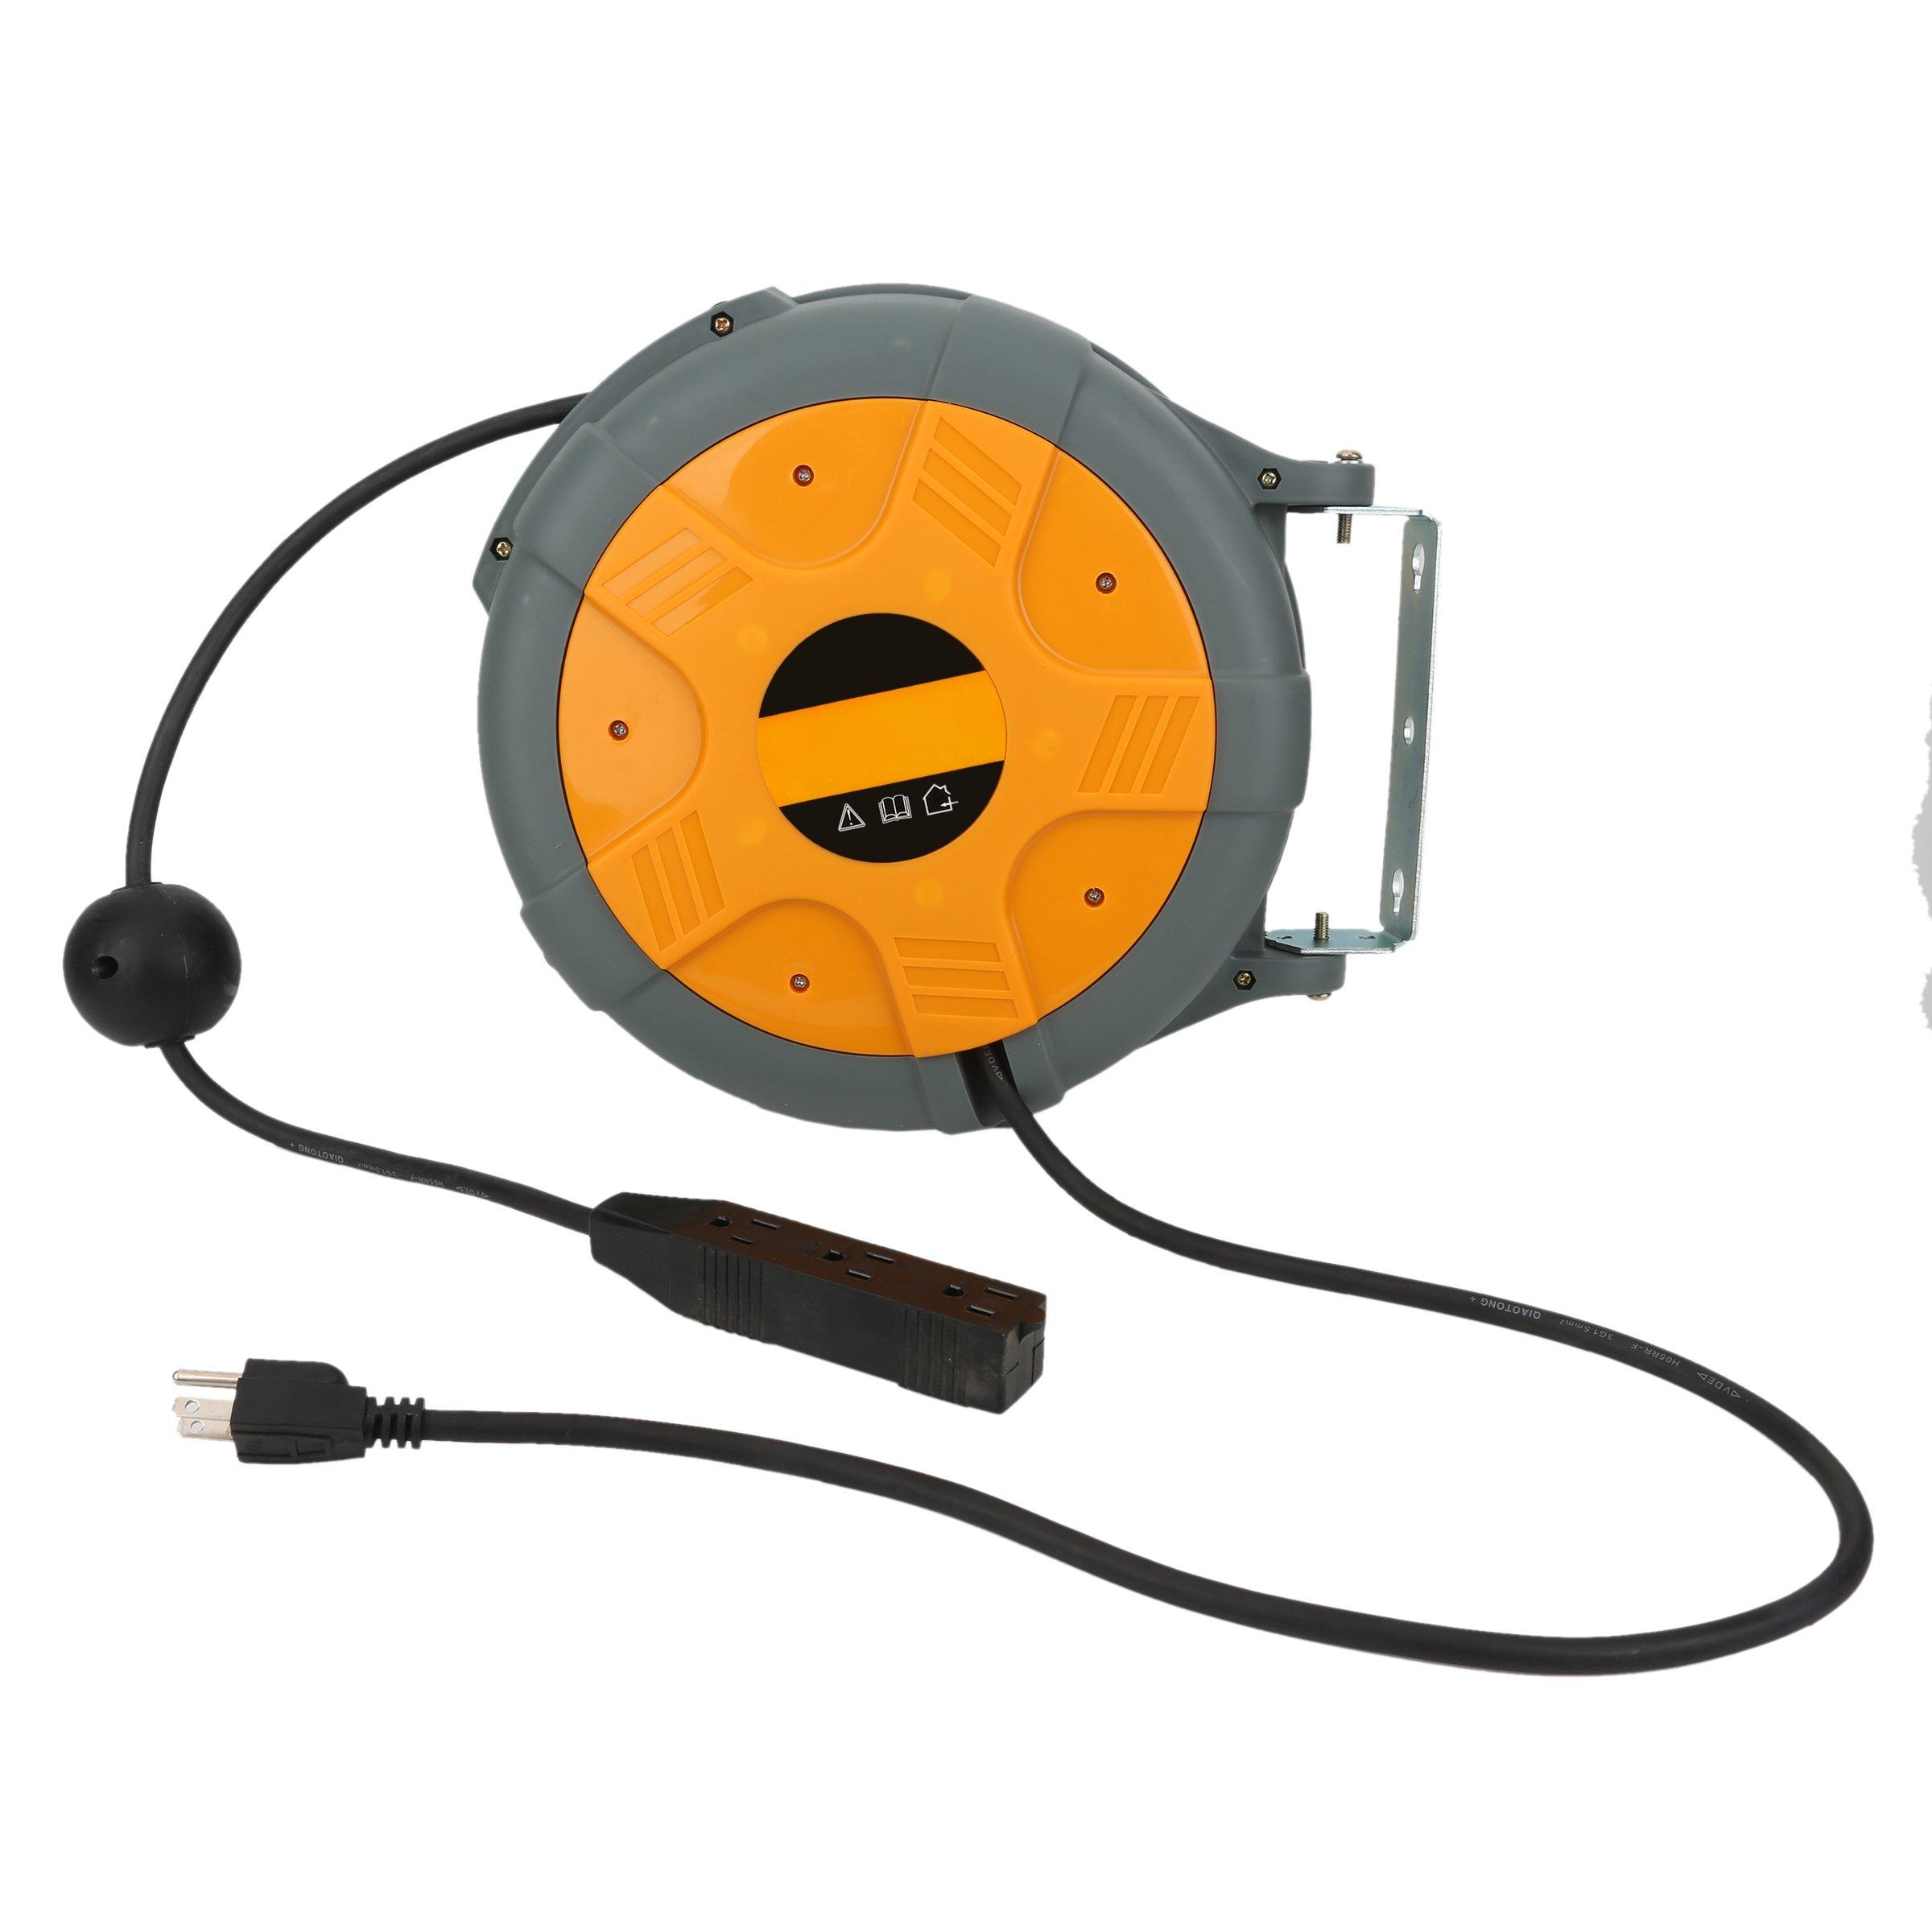 Valianto USA Standard Plug&Wire Design LS-150 10-Meter Electric Auto Rewind Cord Reel by Valianto